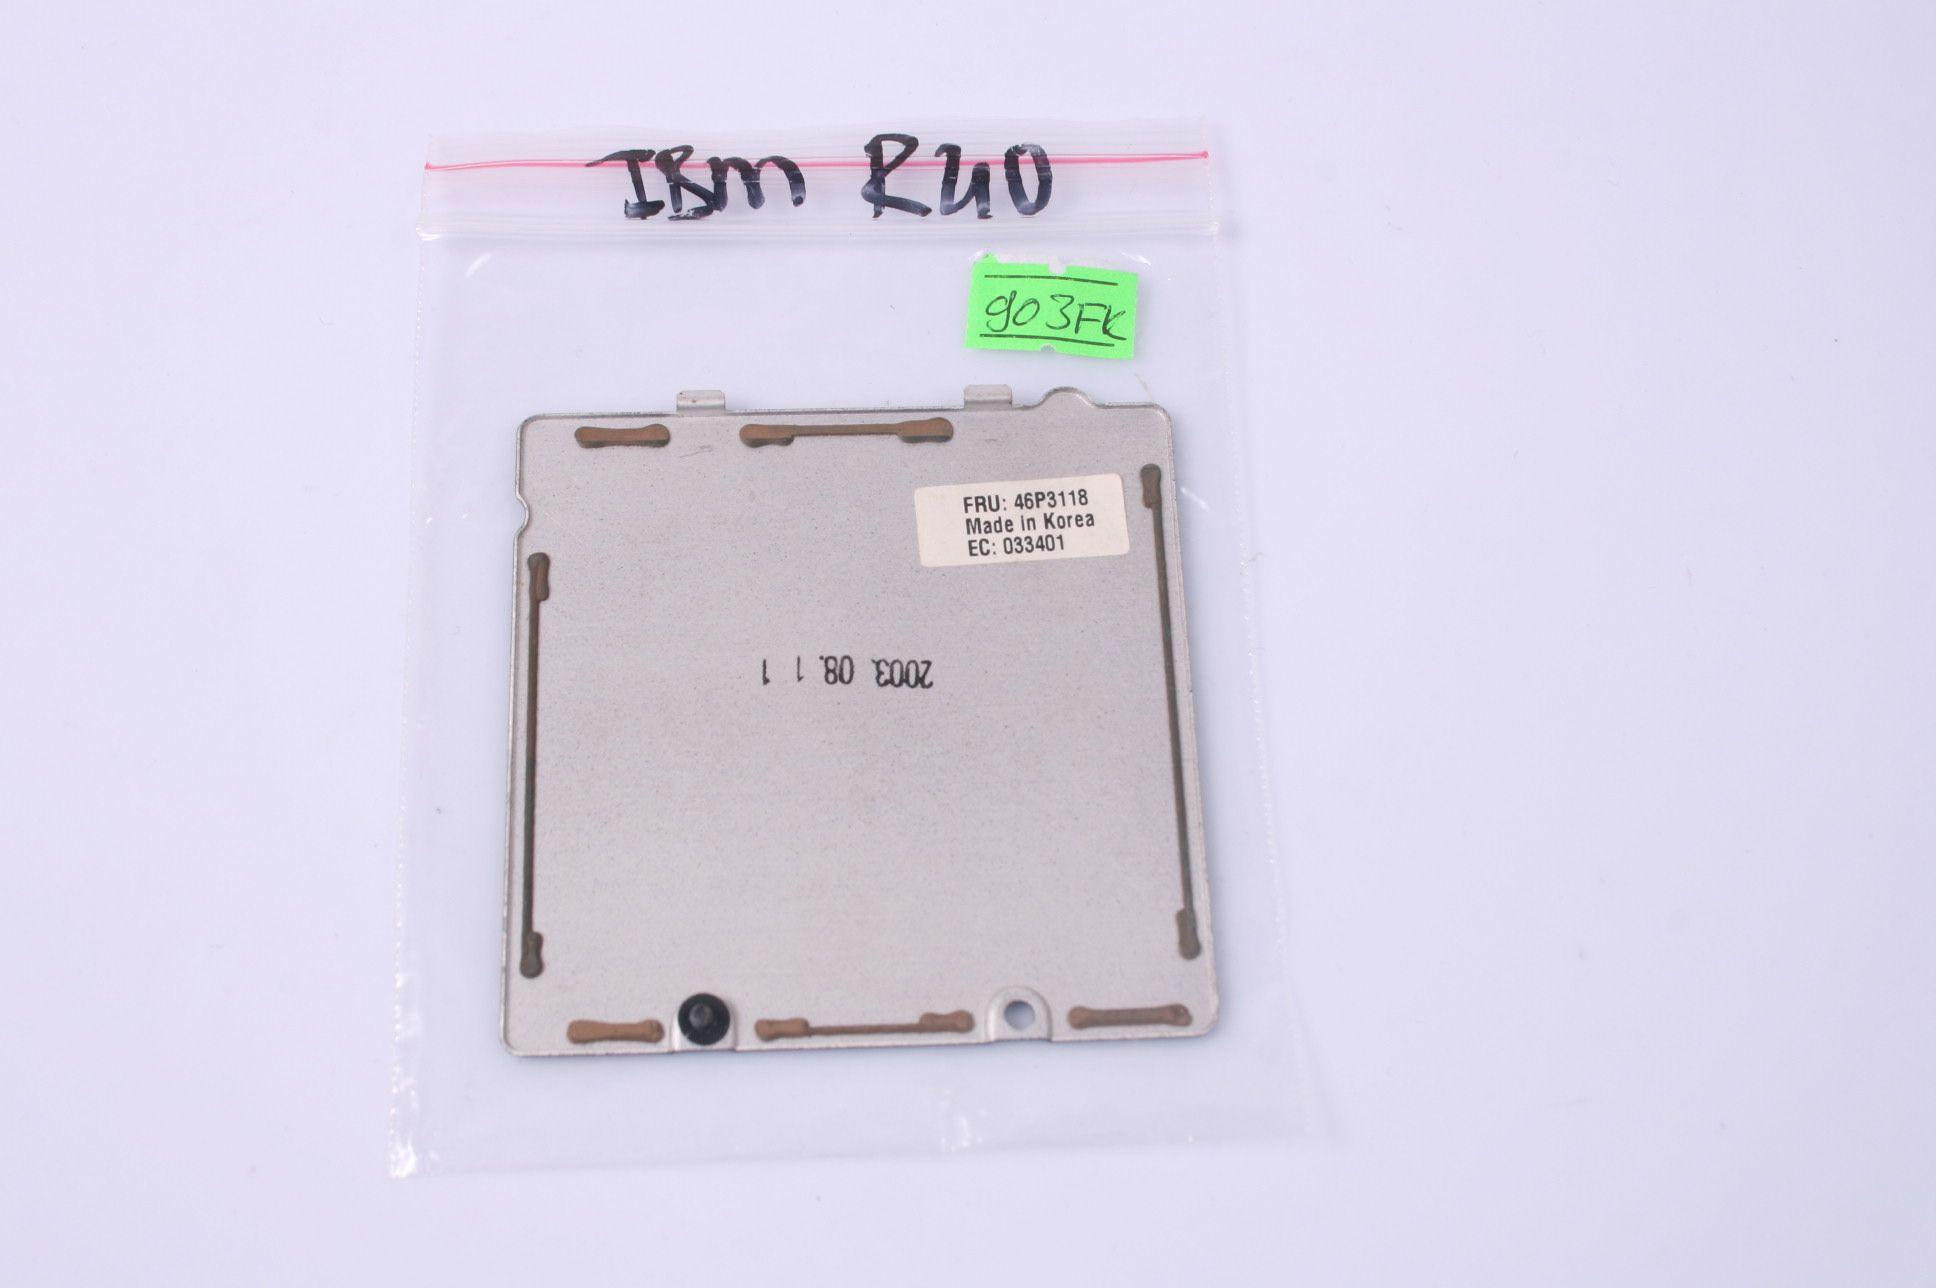 IBM Thinkpad R40 Memory Ram Cover Door 46P3118